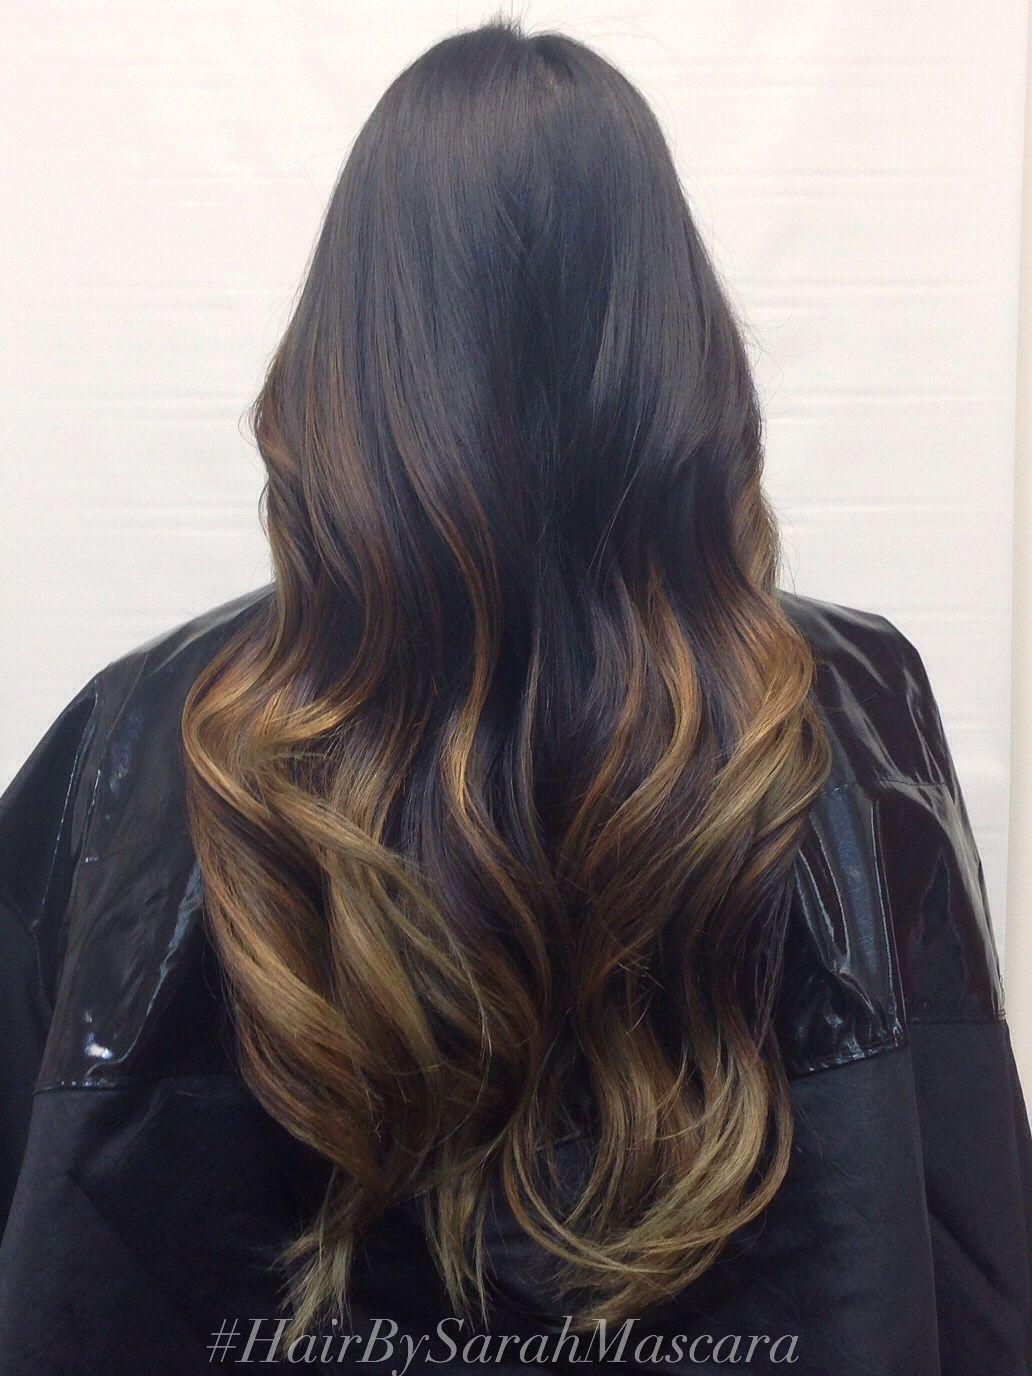 Hair By Sarah Mascara Balayage Hair Hair Color Techniques